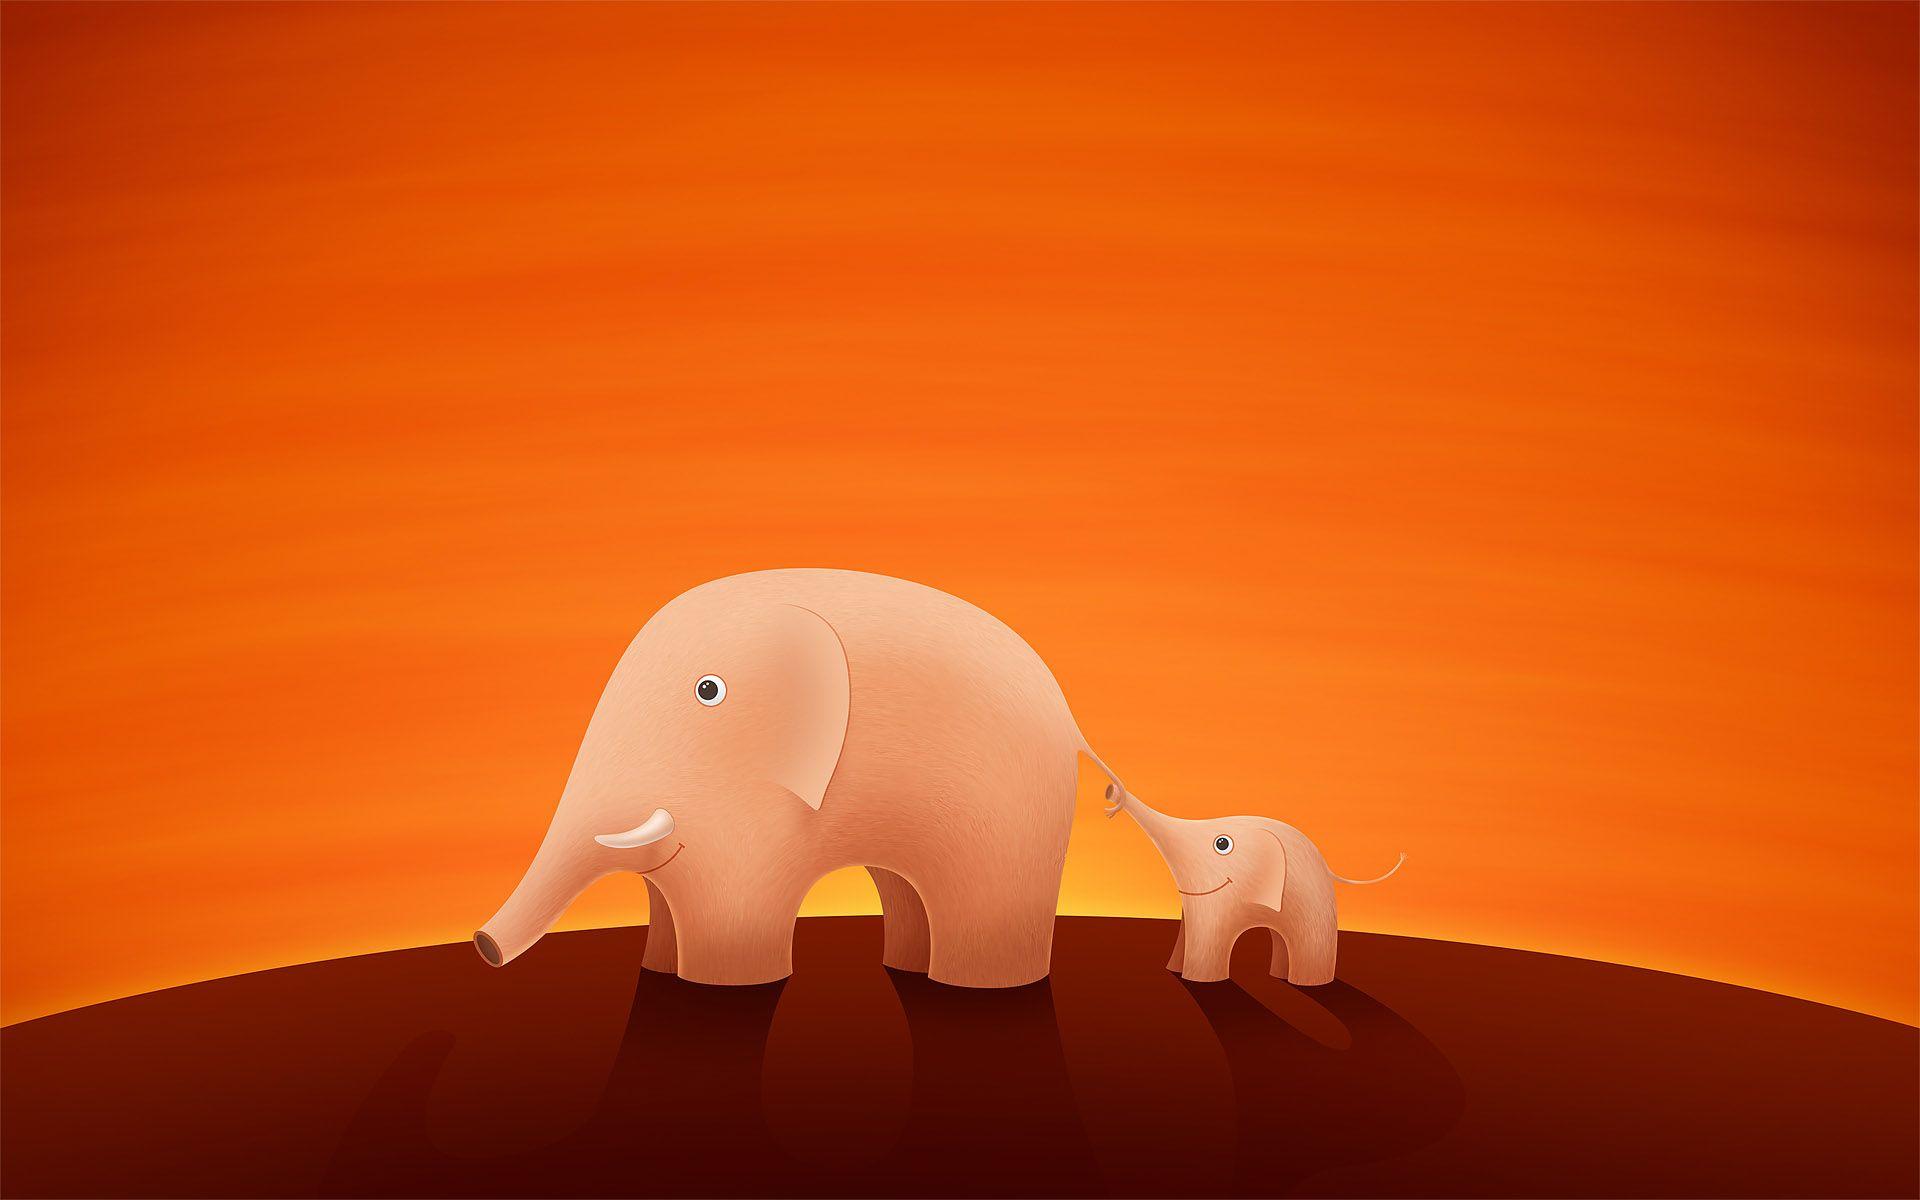 Elephant Hd Desktop Wallpapers Elephant Pictures 1920 1200 Elephant Backgrounds For Desktop 37 Wallpap Elephant Wallpaper Animal Wallpaper Elephant Pictures